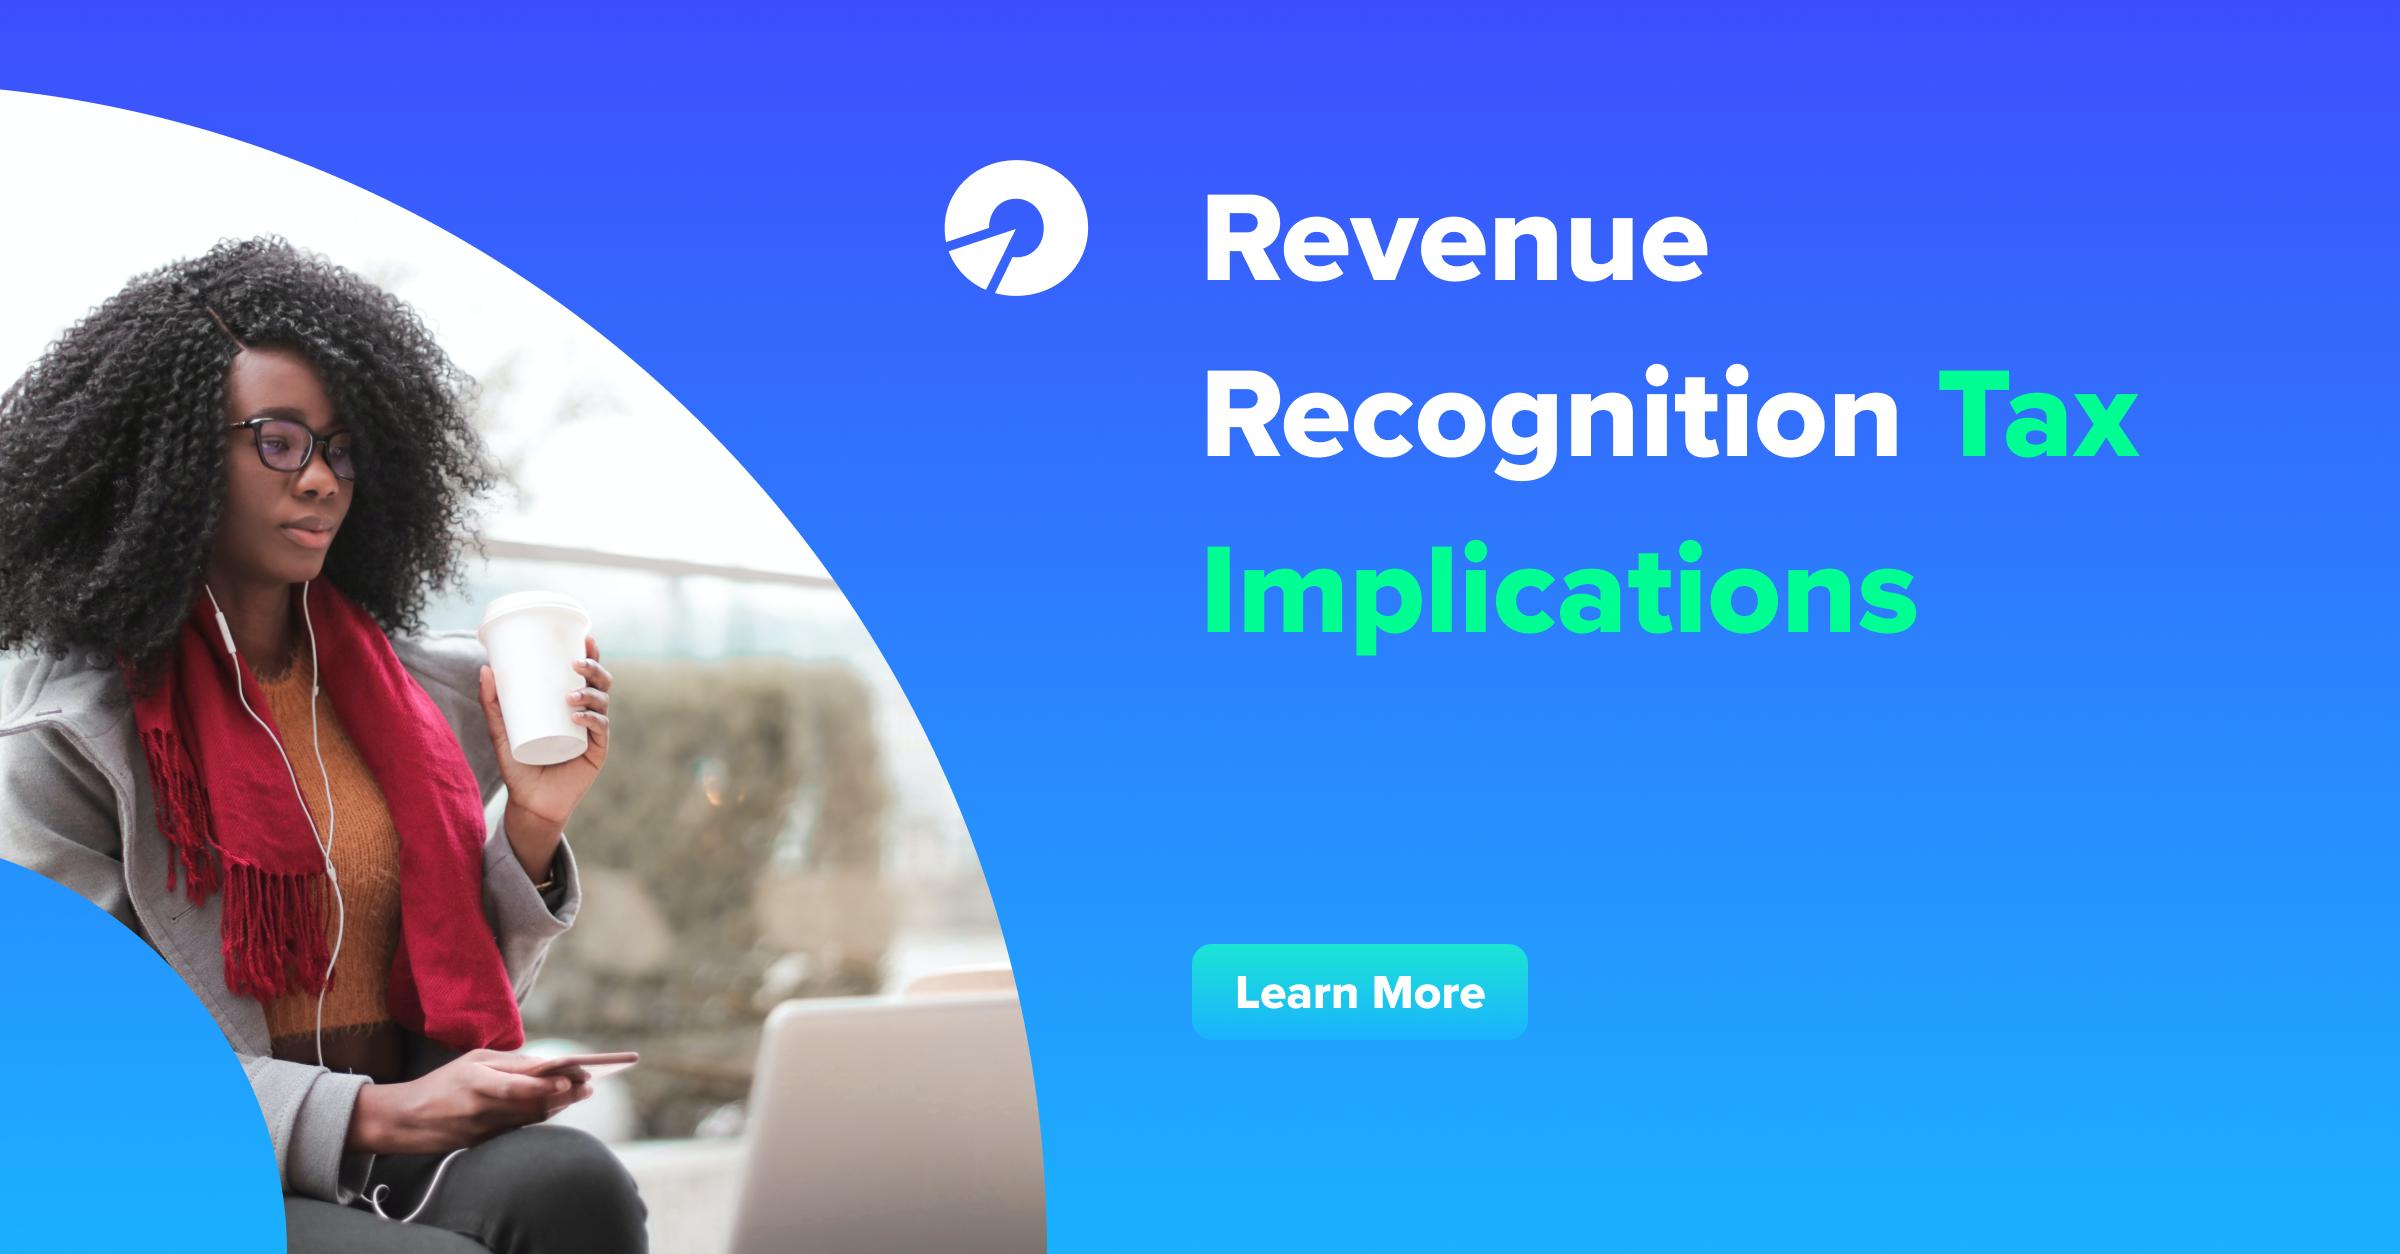 Revenue Recognition Tax Implications